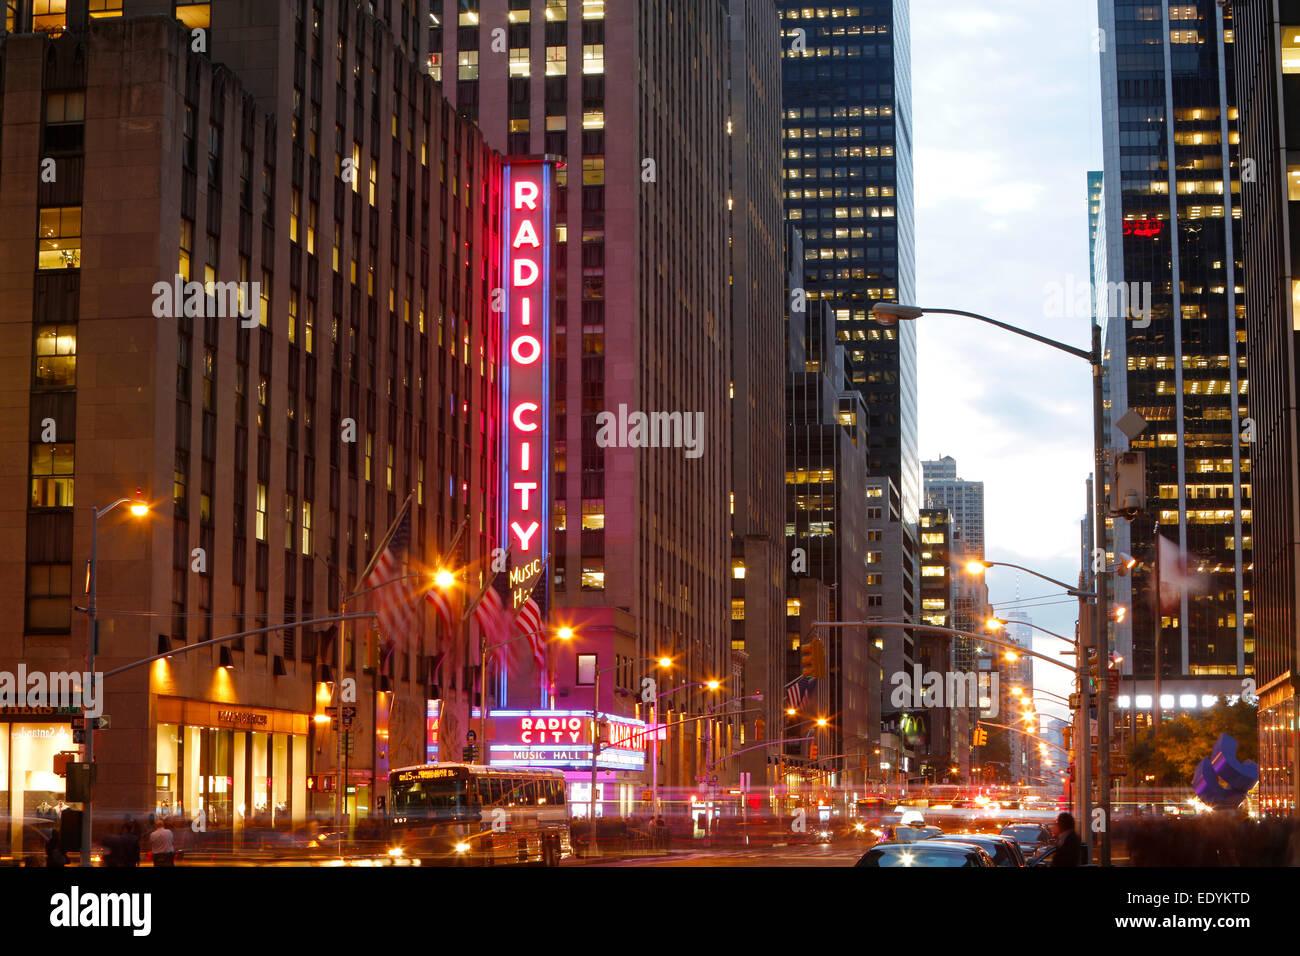 Radio City Music Hall, 1260 Avenue of the Americas, New York City, New York, United States - Stock Image